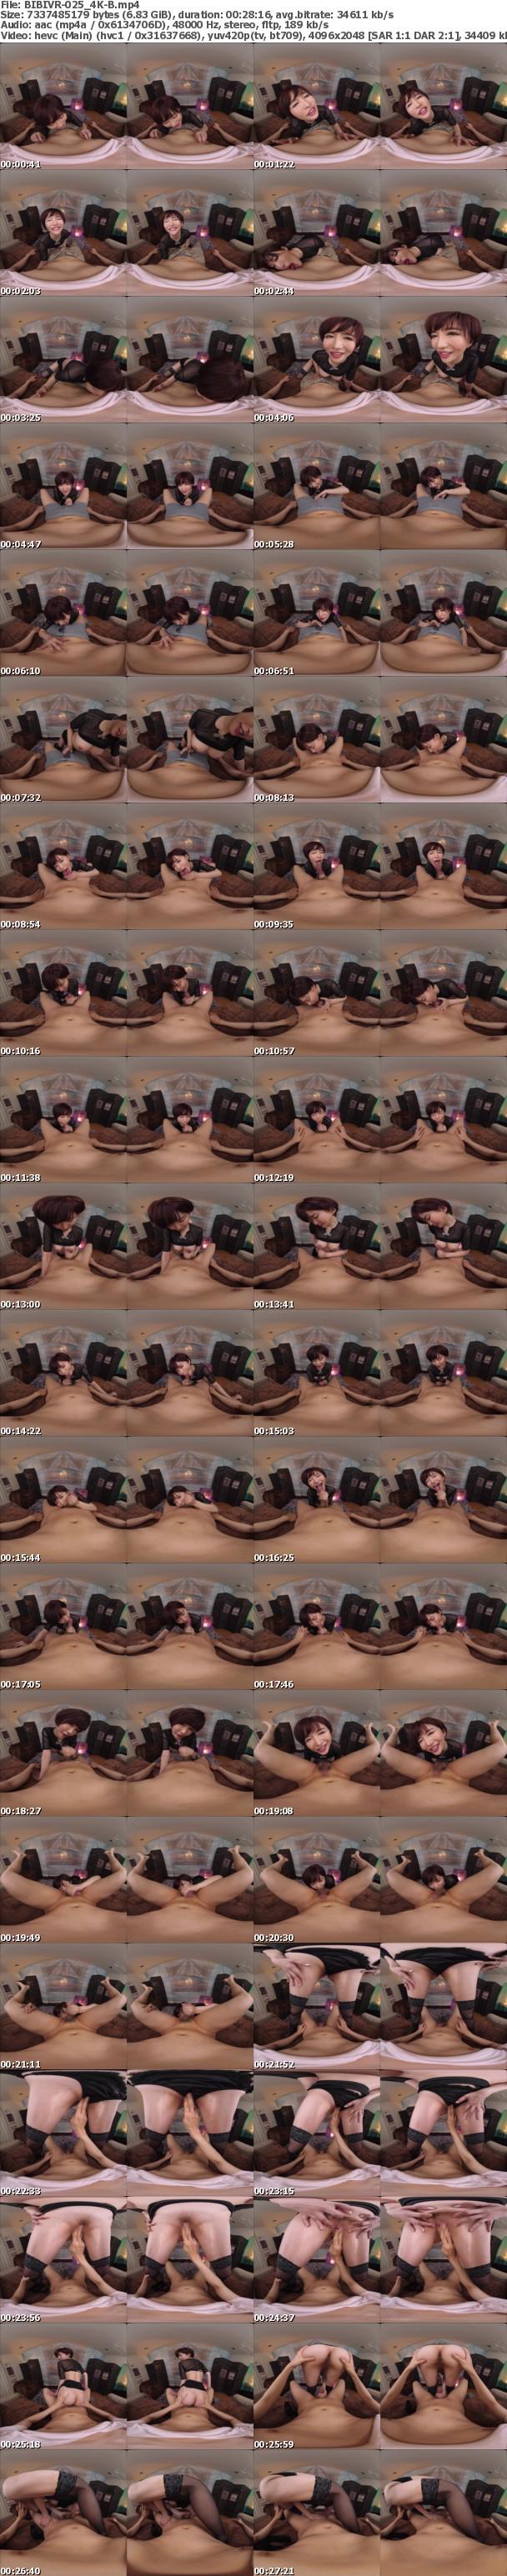 (VR) (4K) BIBIVR-025 上質な『唇』と『舌』でしなやかに奏でる濃密フェラチオclub 里美ゆりあ